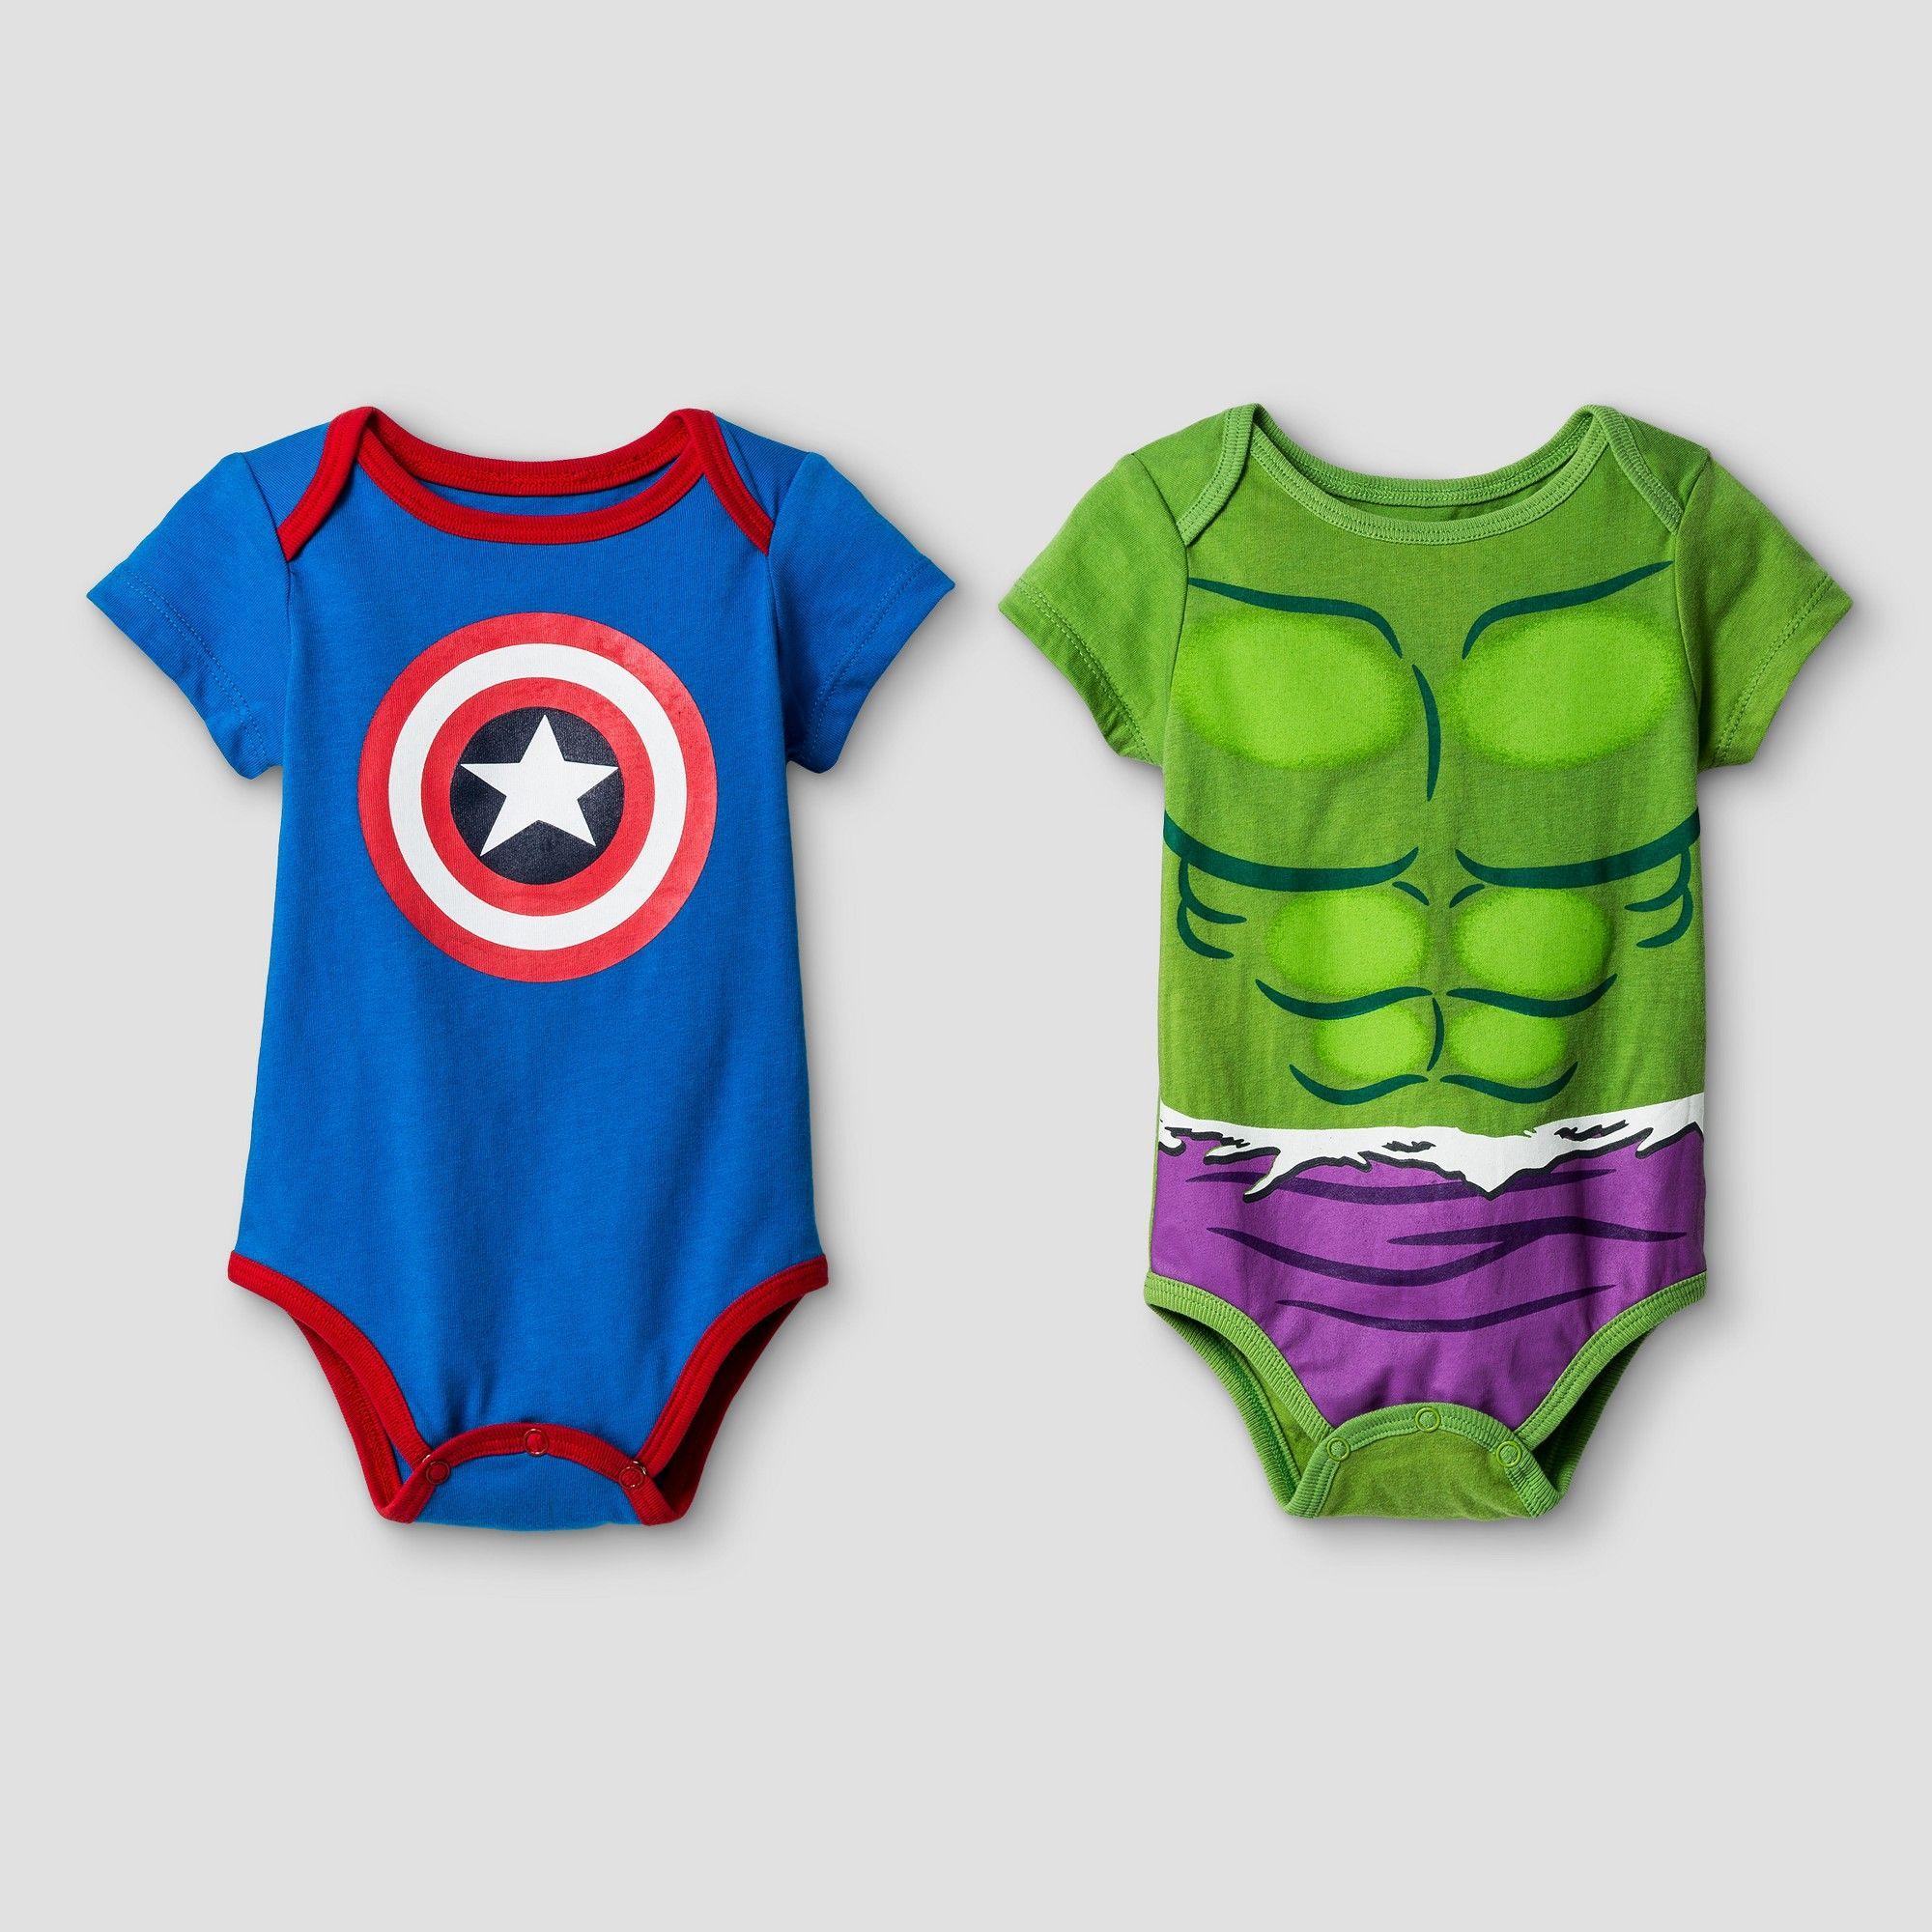 e64c33f0c Disney Baby Boys  Hulk and Captain America 2pk Short Sleeve Bodysuit ...